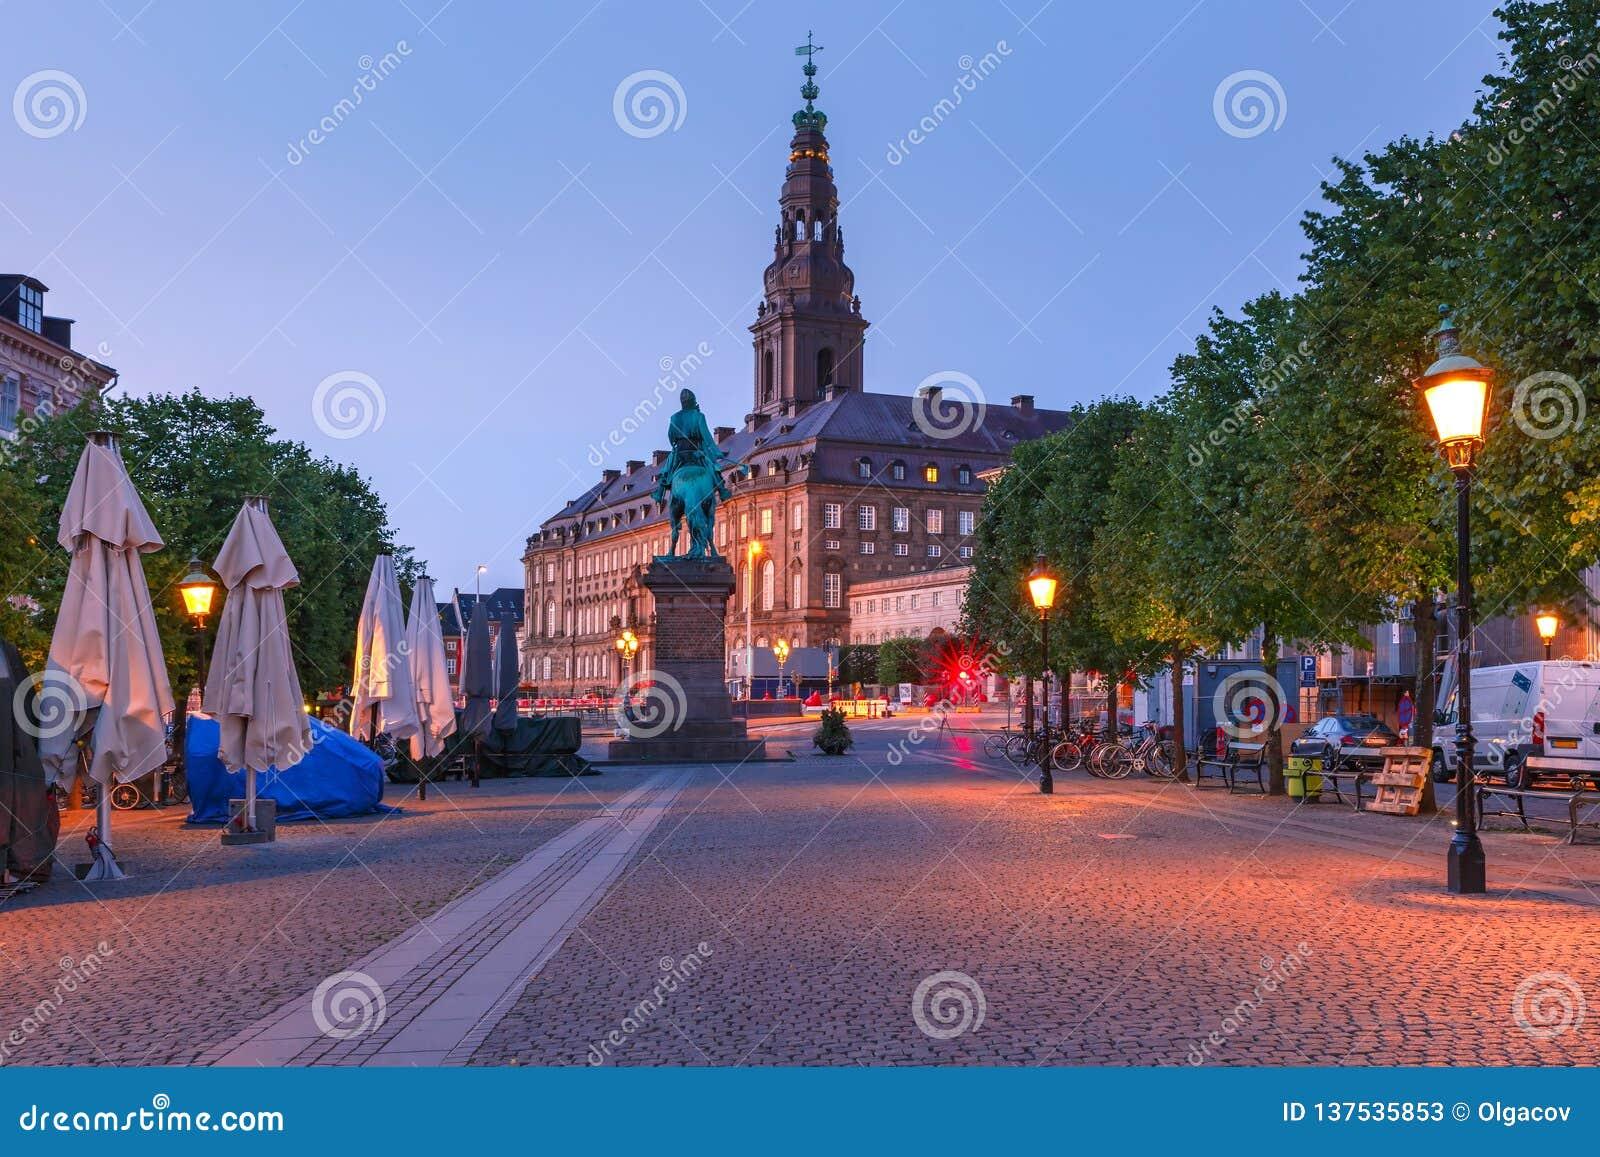 Palais de Christiansborg, Copenhague, Danemark